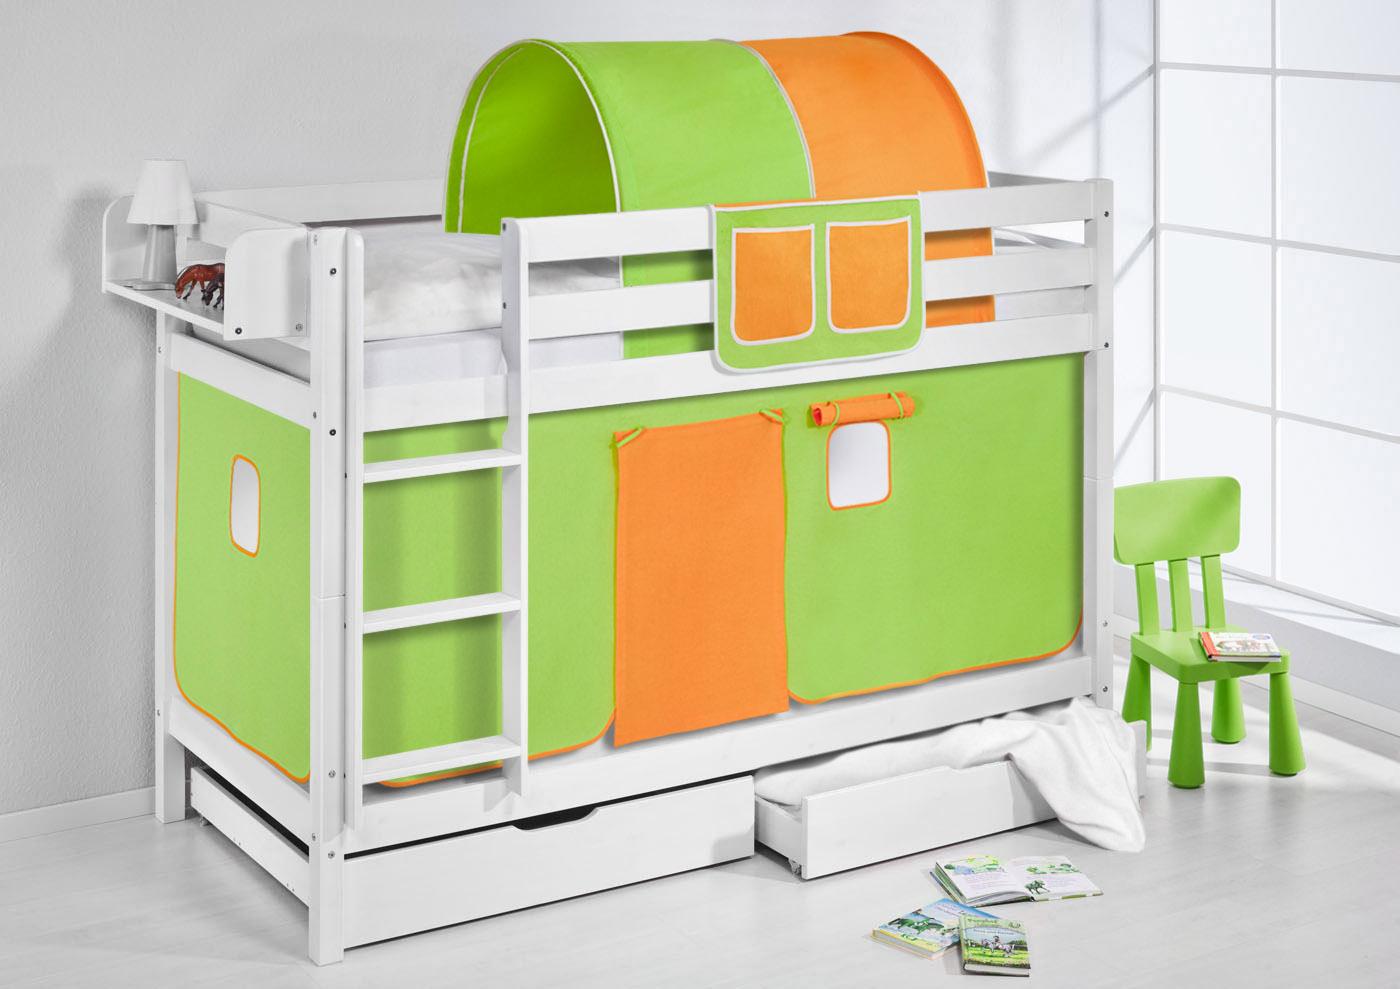 etagenbett hochbett kinder bett aus massiver kiefer jelle wei vorhang ebay. Black Bedroom Furniture Sets. Home Design Ideas